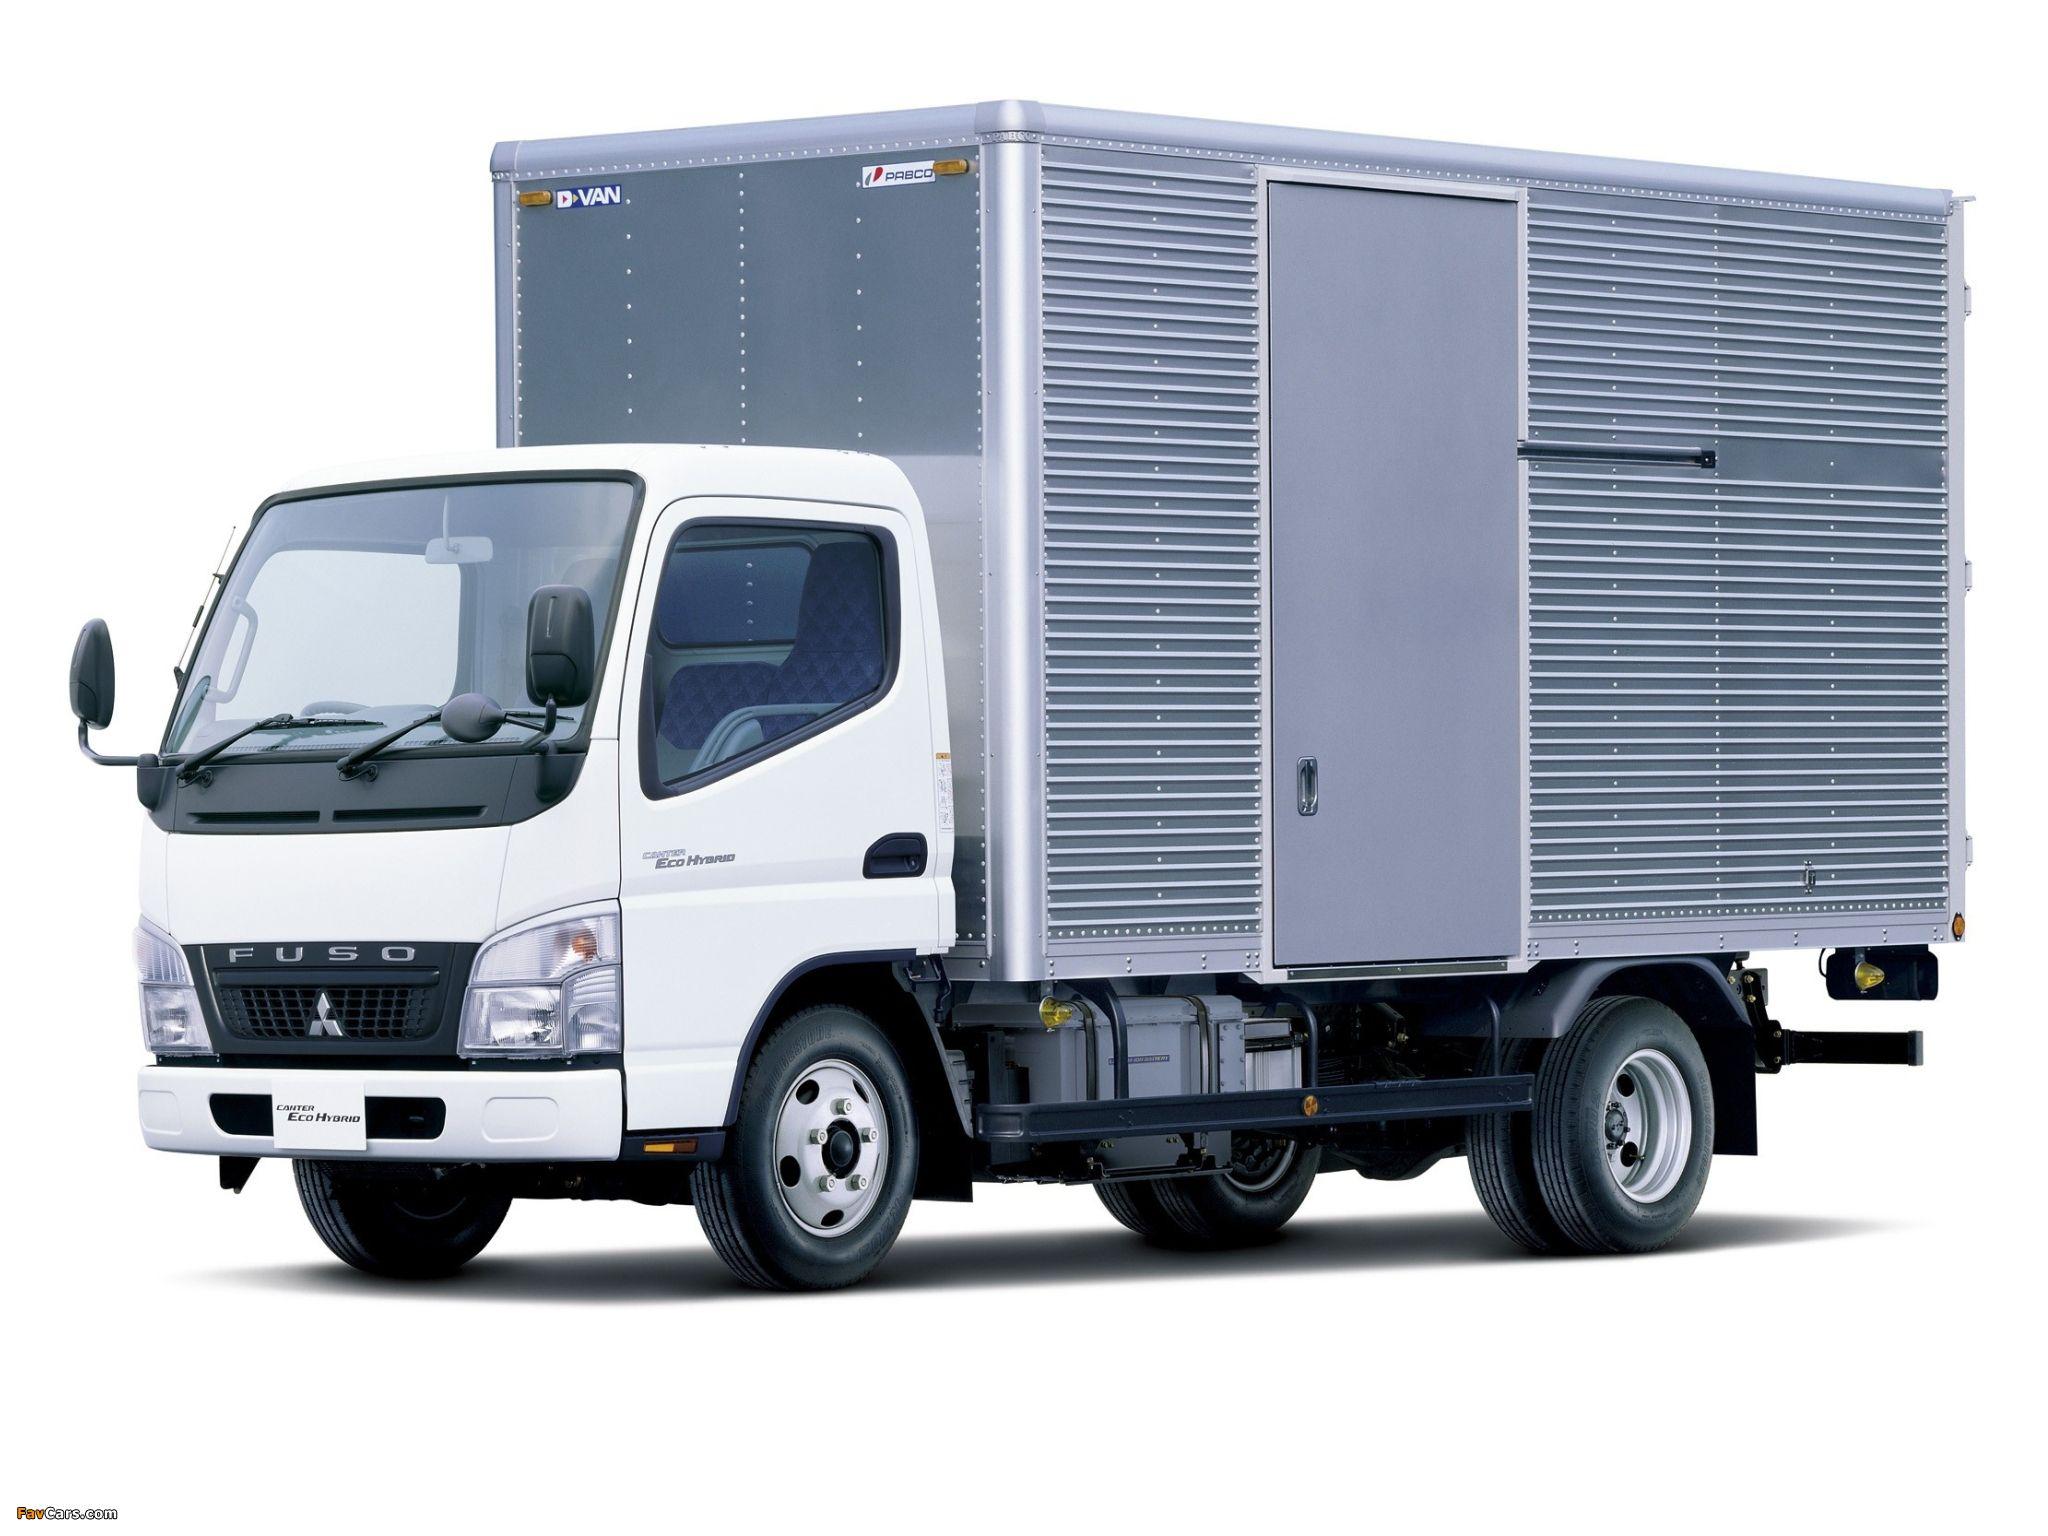 Photos Of Mitsubishi Fuso Canter Guts Eco Hybrid Fb7 2006 Mitsubishi Canter Mitsubishi Truck Mitsubishi